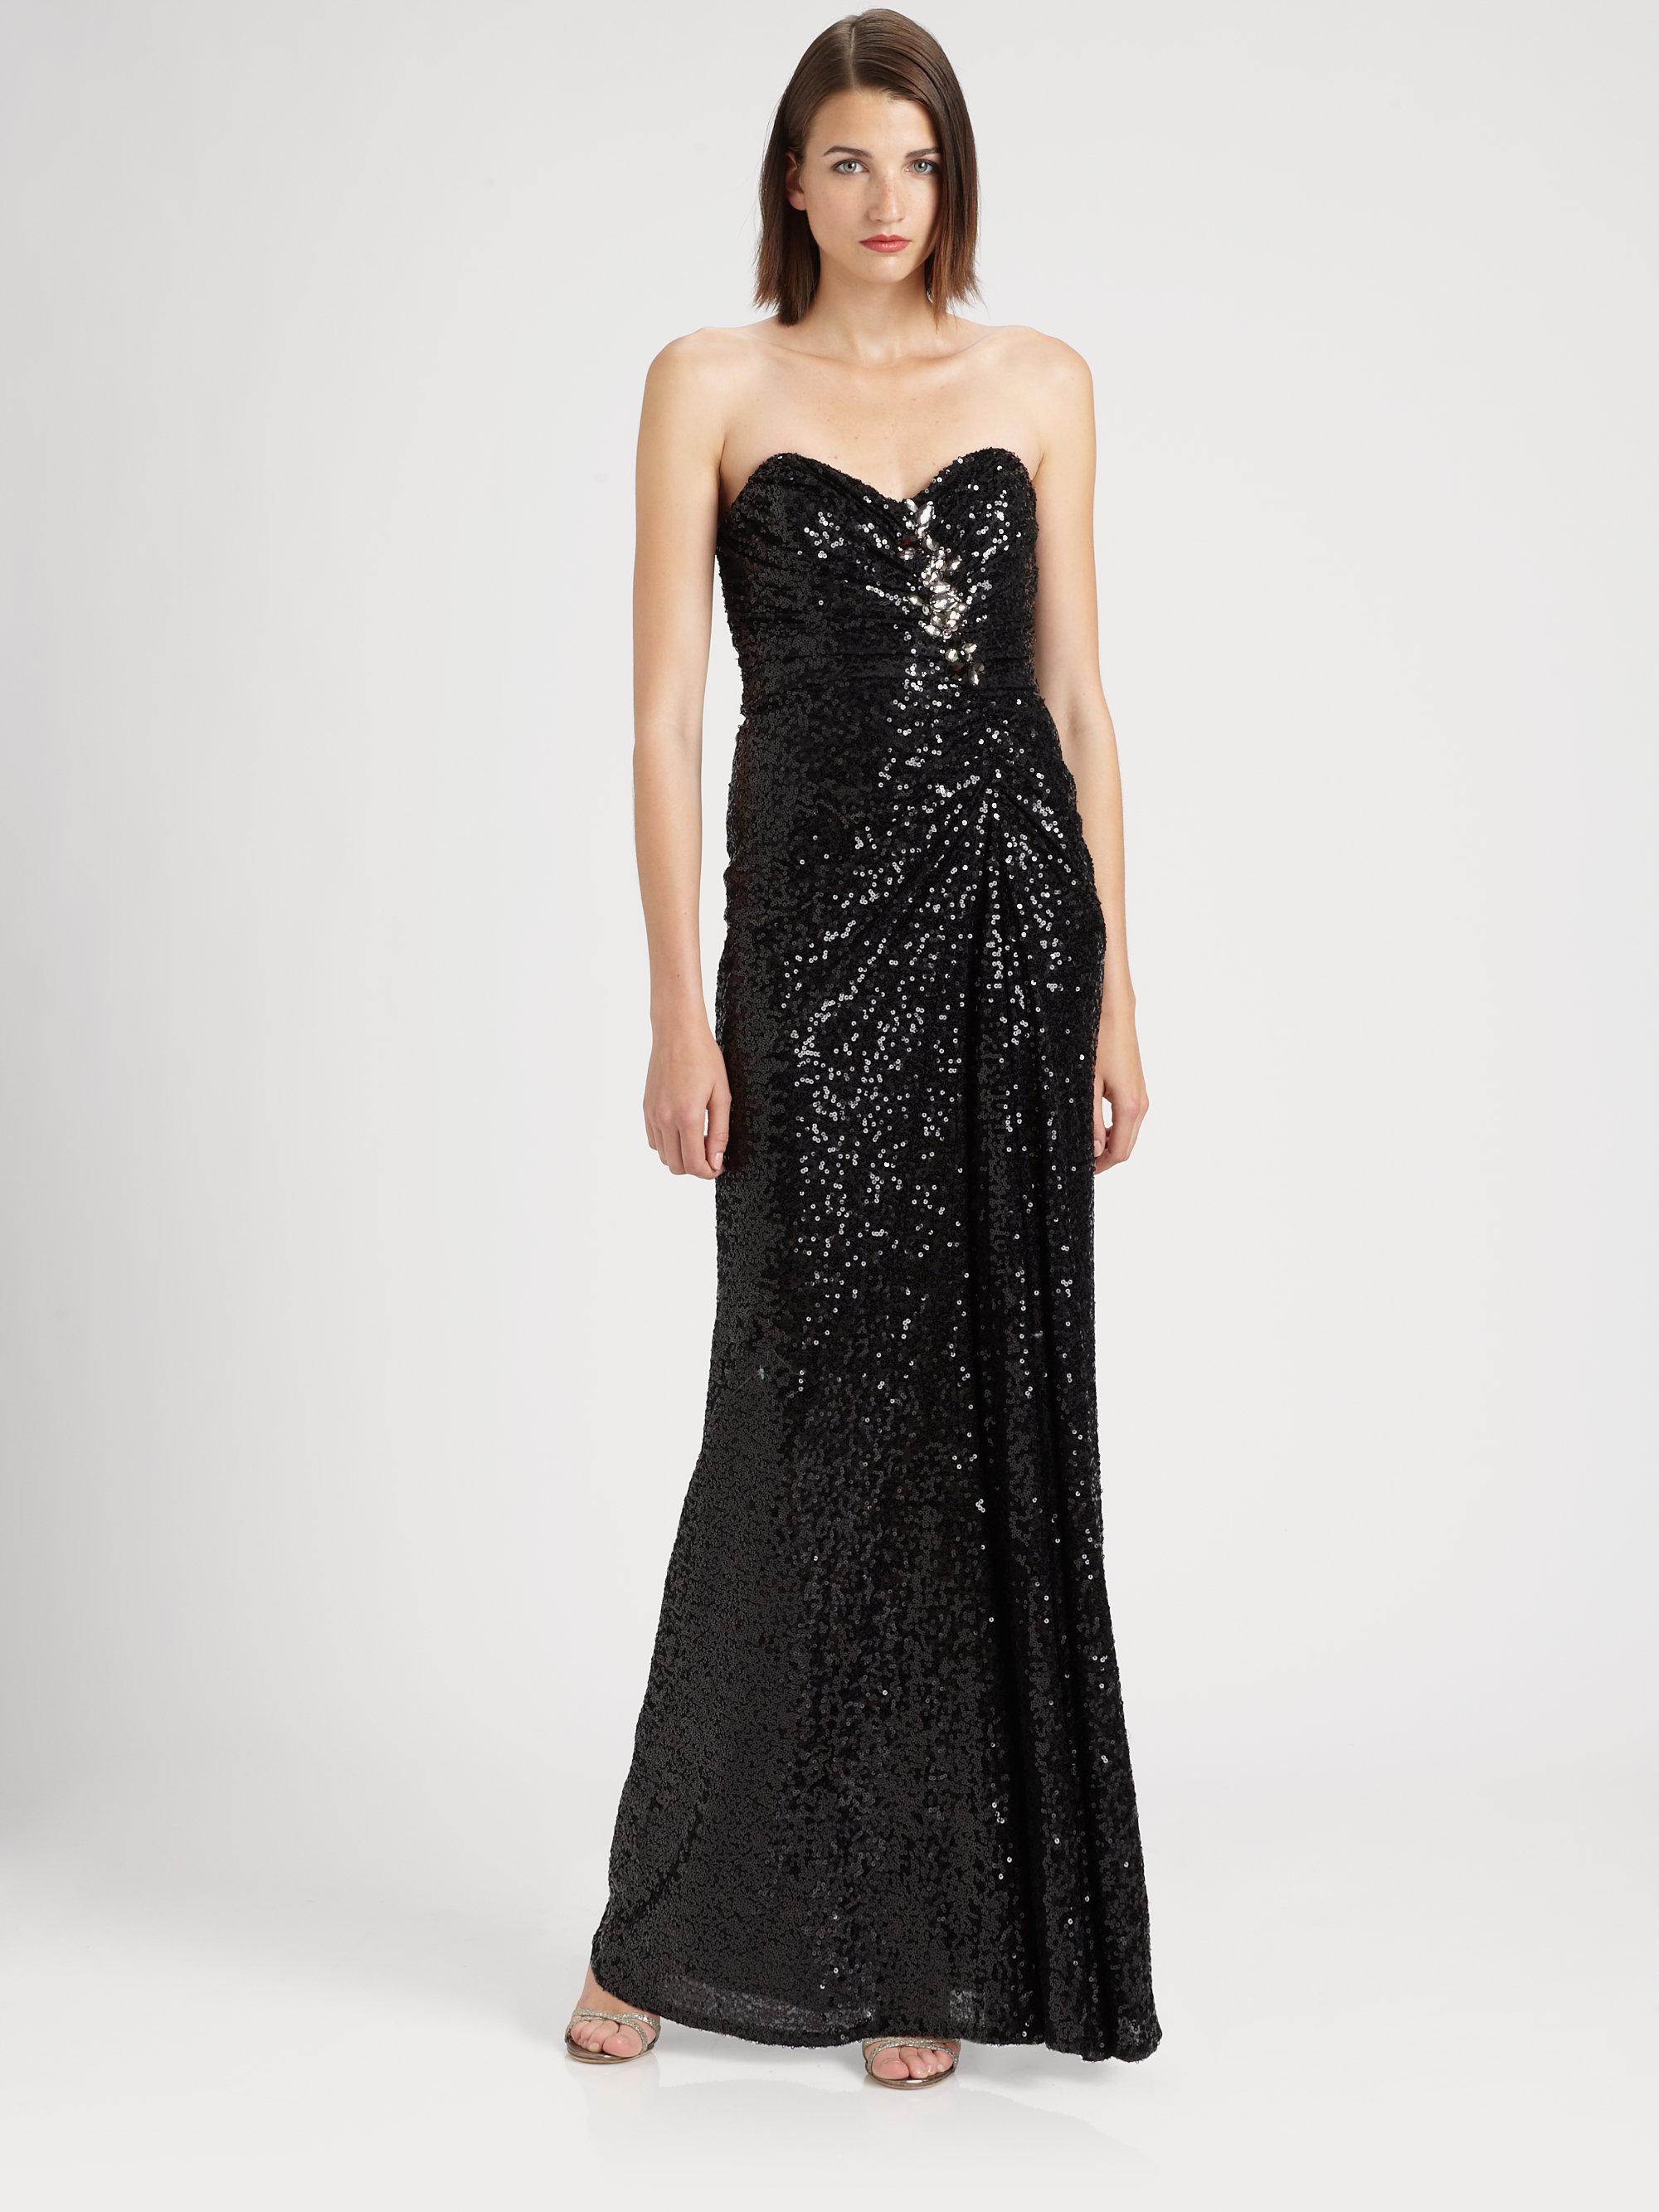 Lyst - Badgley Mischka Strapless Sequined Gown in Black